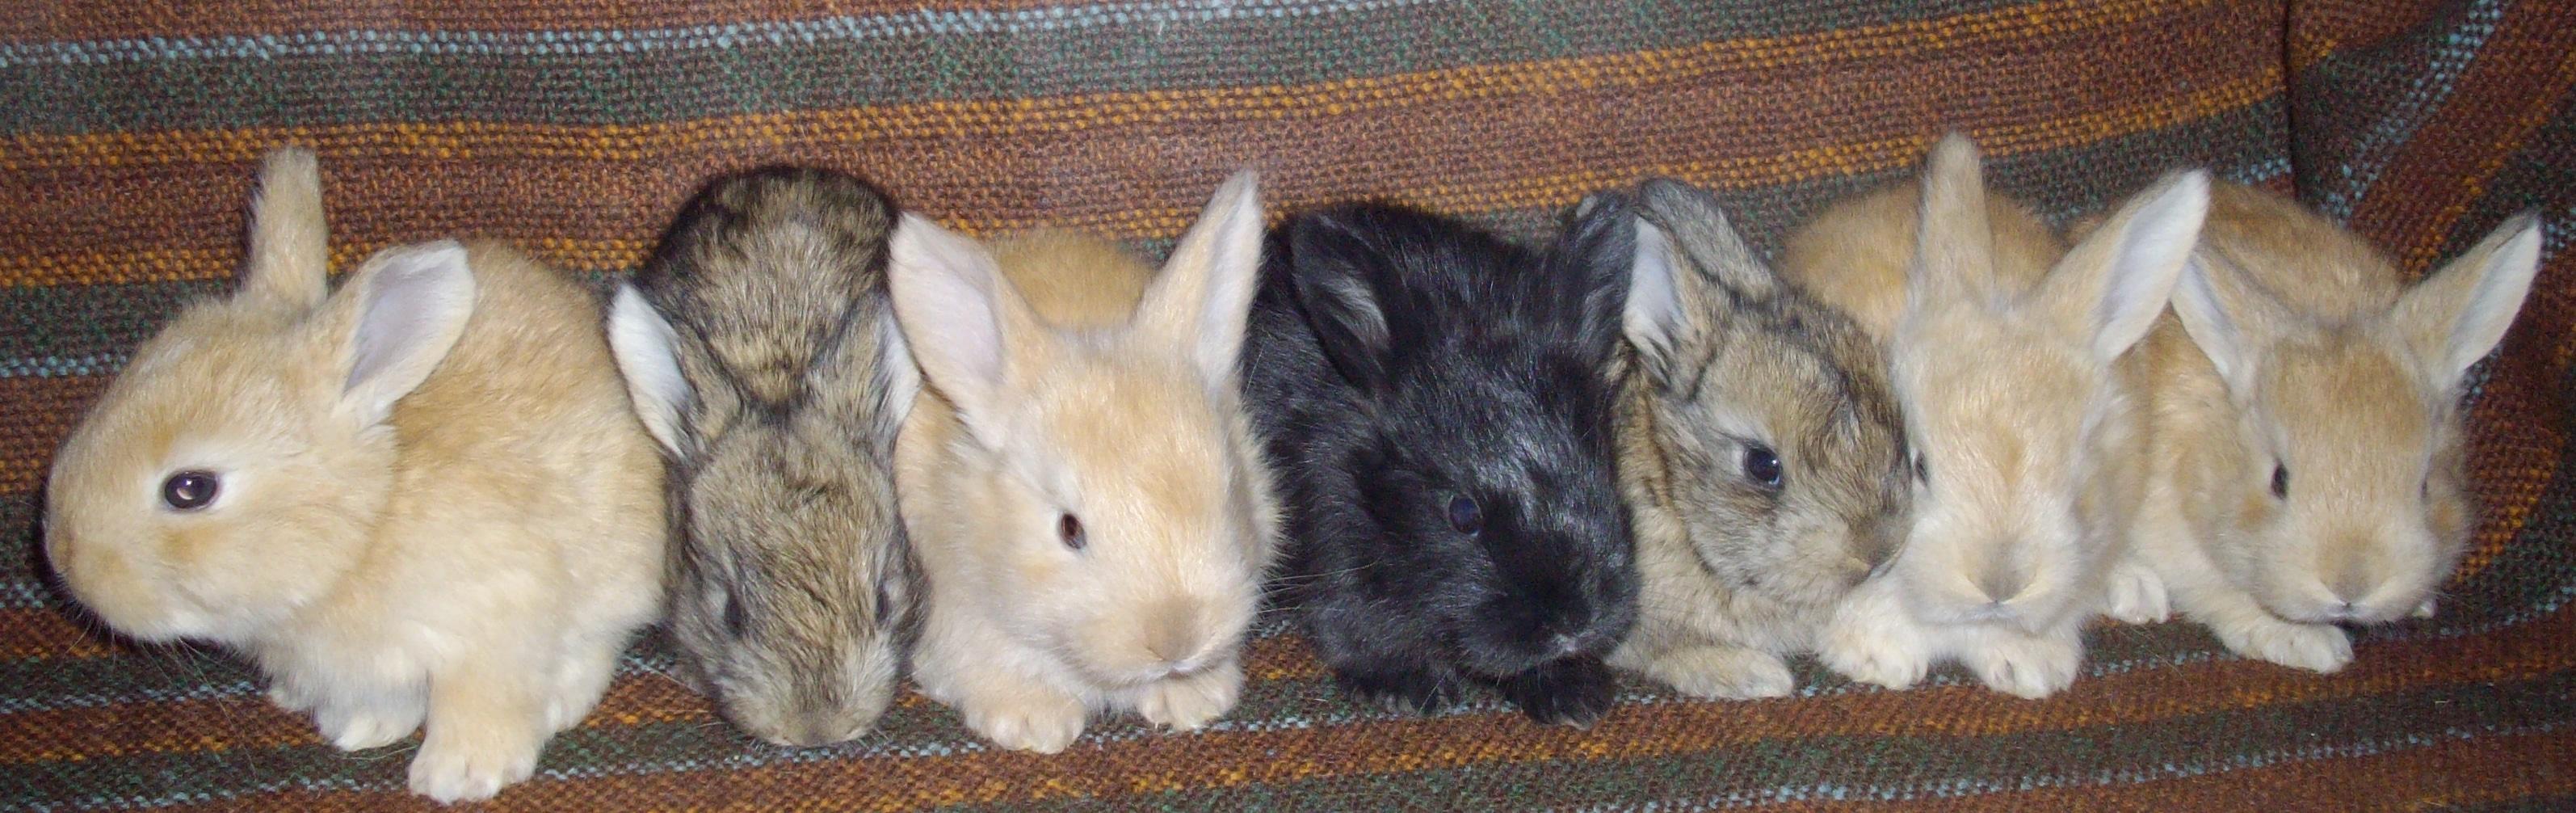 agouti gene - Angora rabbits